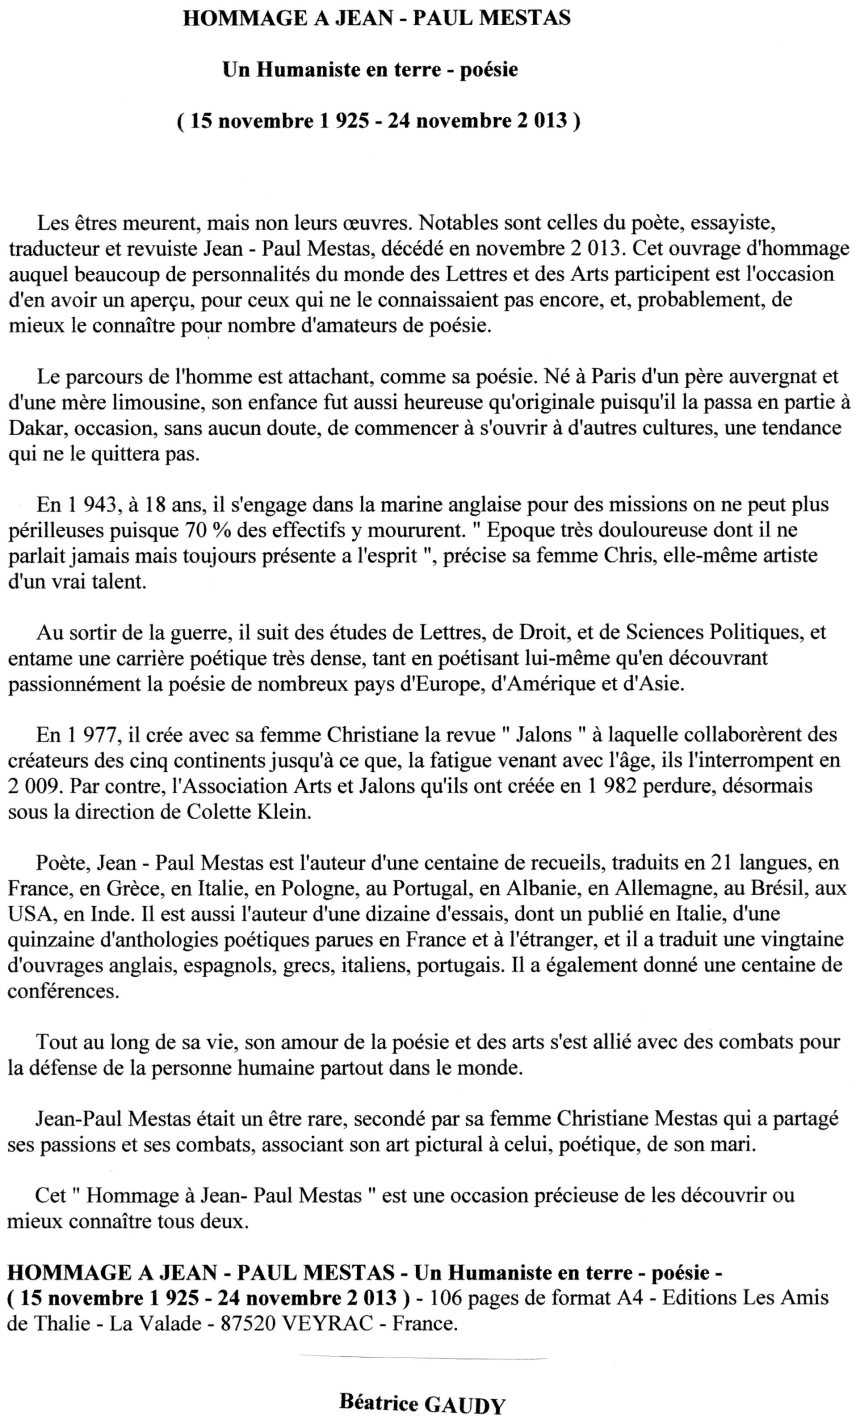 Béatrice Gaudy - Chronique 2 - 12 7 15